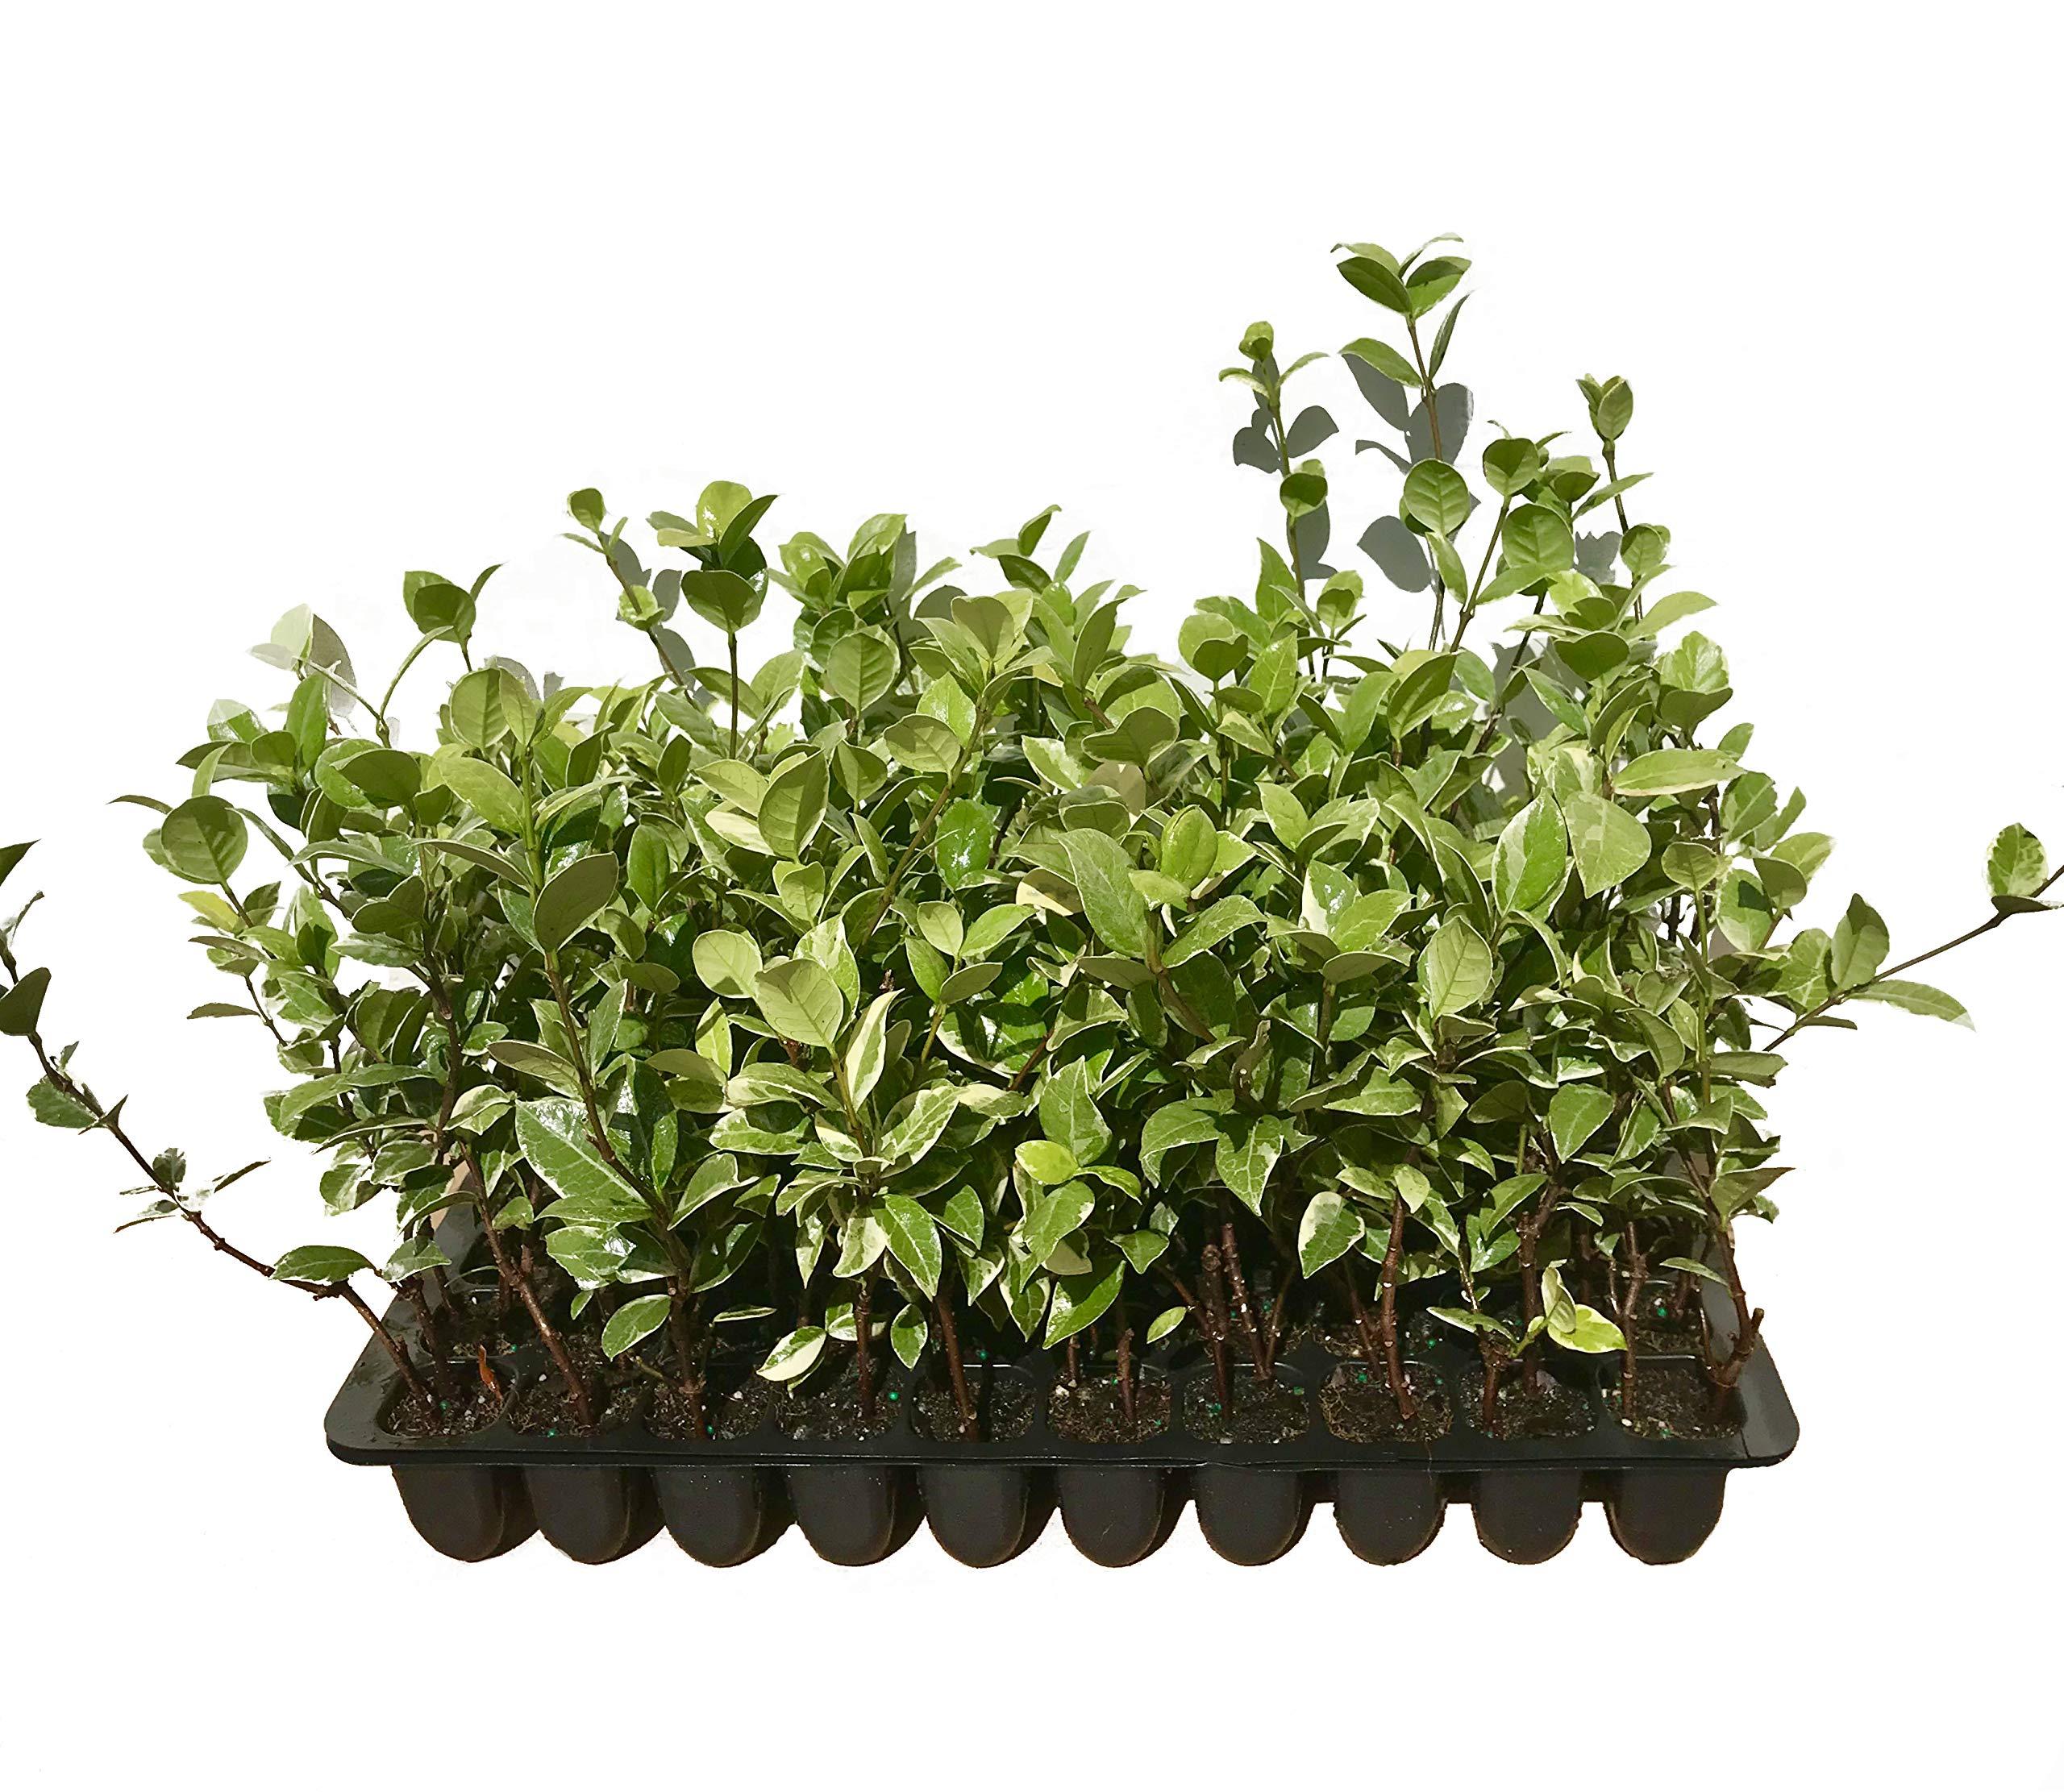 Confederate Jasmine Variegated - 20 Live Plants - Trachelospermum Jasminoides Variegatum - Fragrant Blooming Evergreen Vine by Florida Foliage